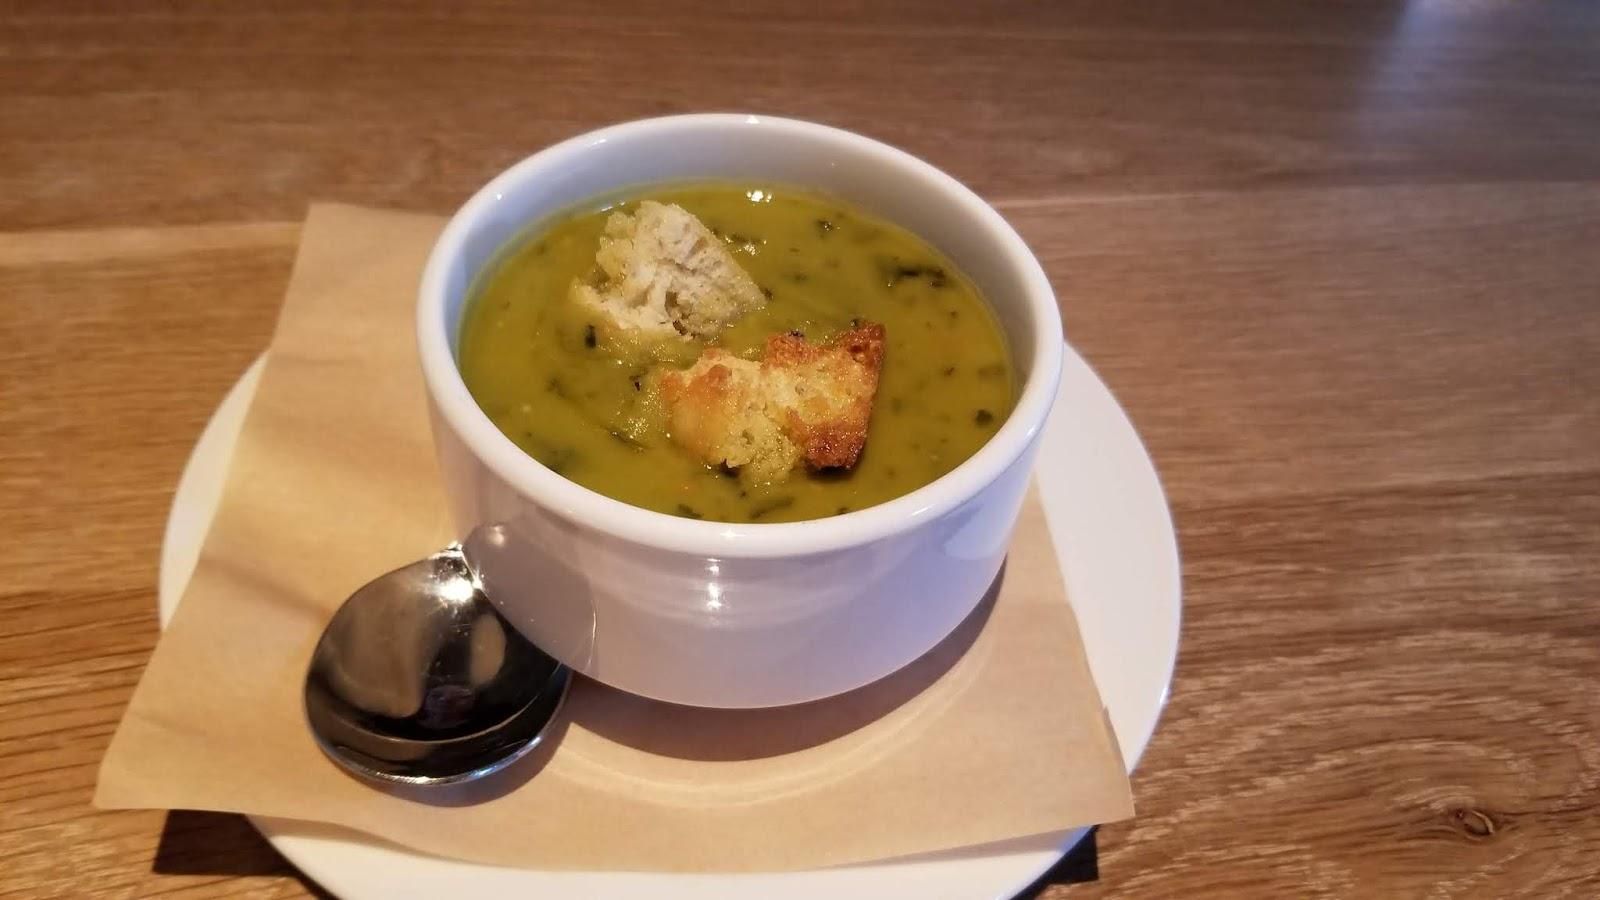 Seasons 52 split pea and kale soup